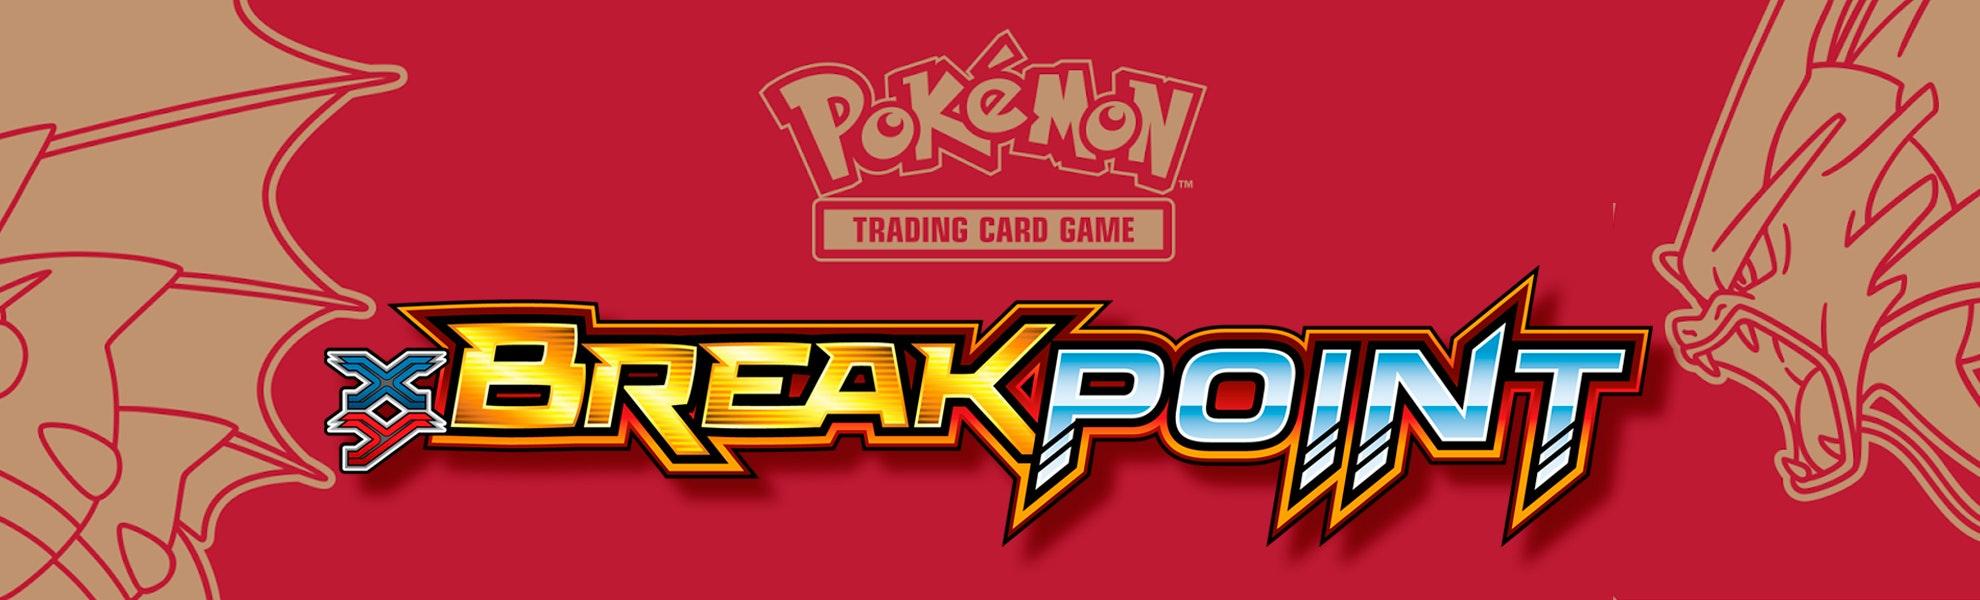 Pokémon XY BREAKpoint Elite Trainer Box Prerelease